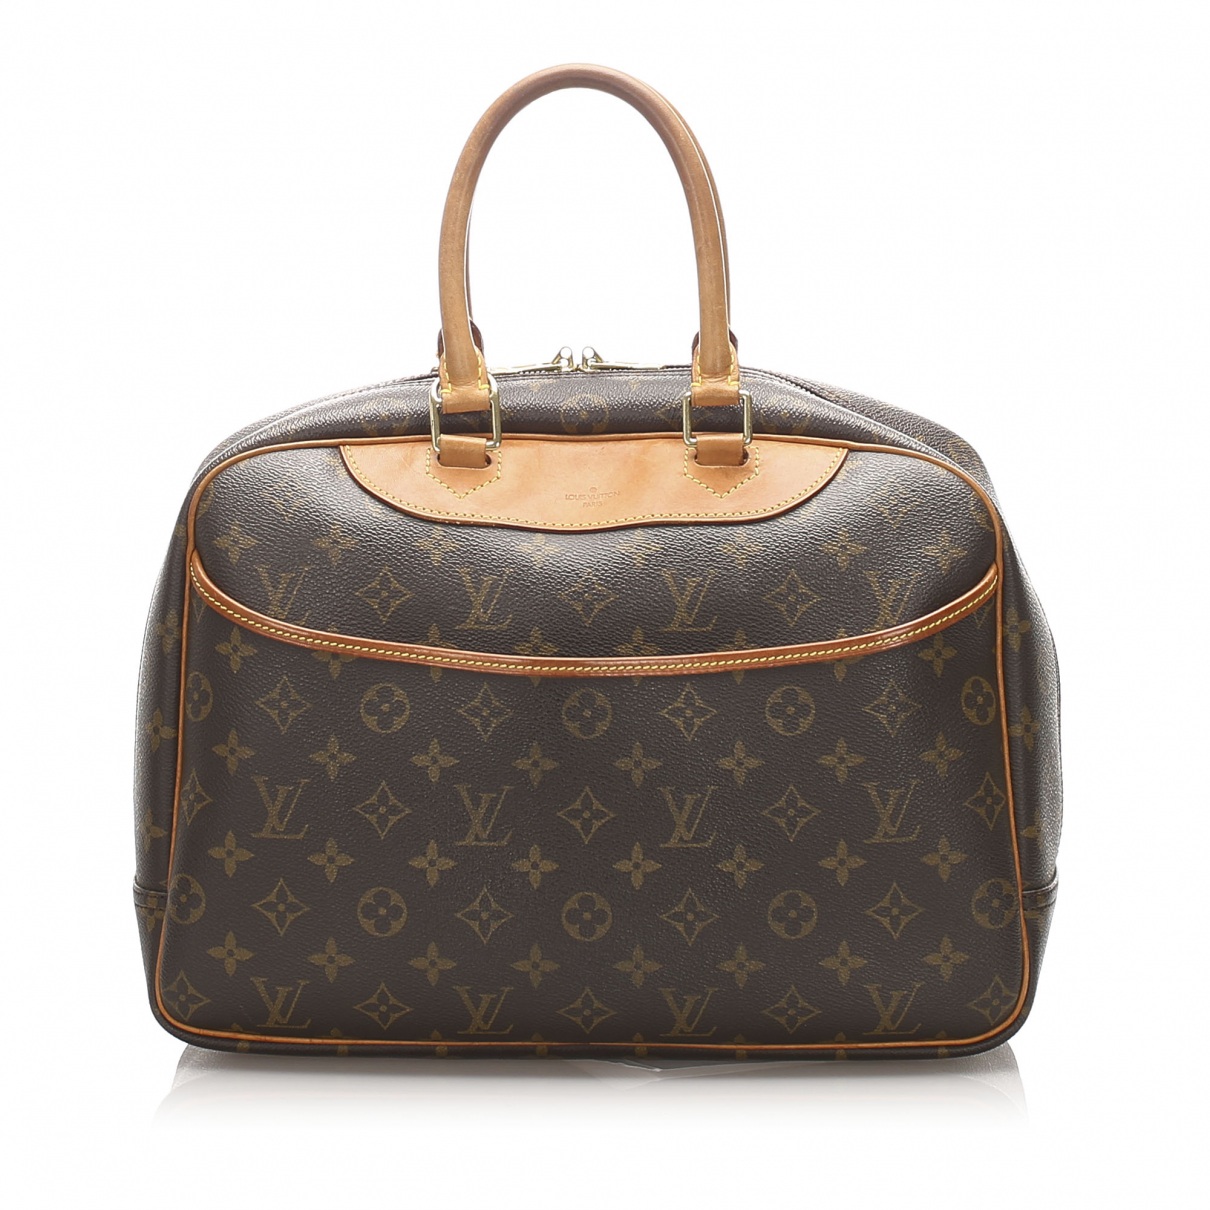 Bolso Deauville de Lona Louis Vuitton